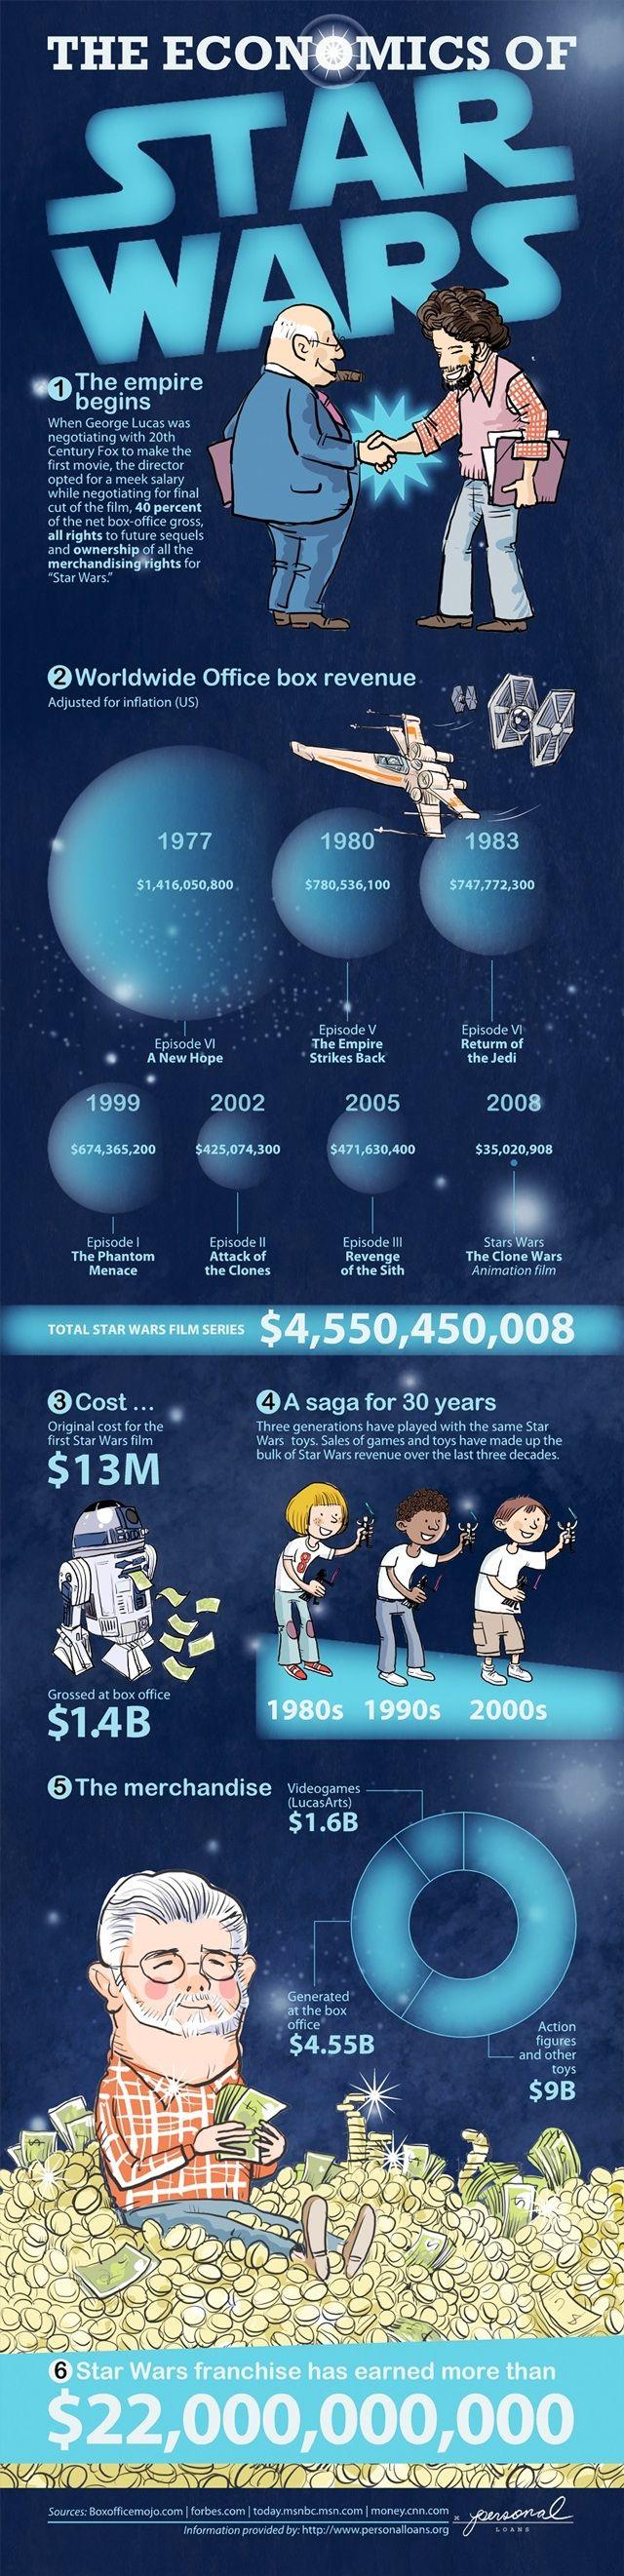 The economics of Star Wars.